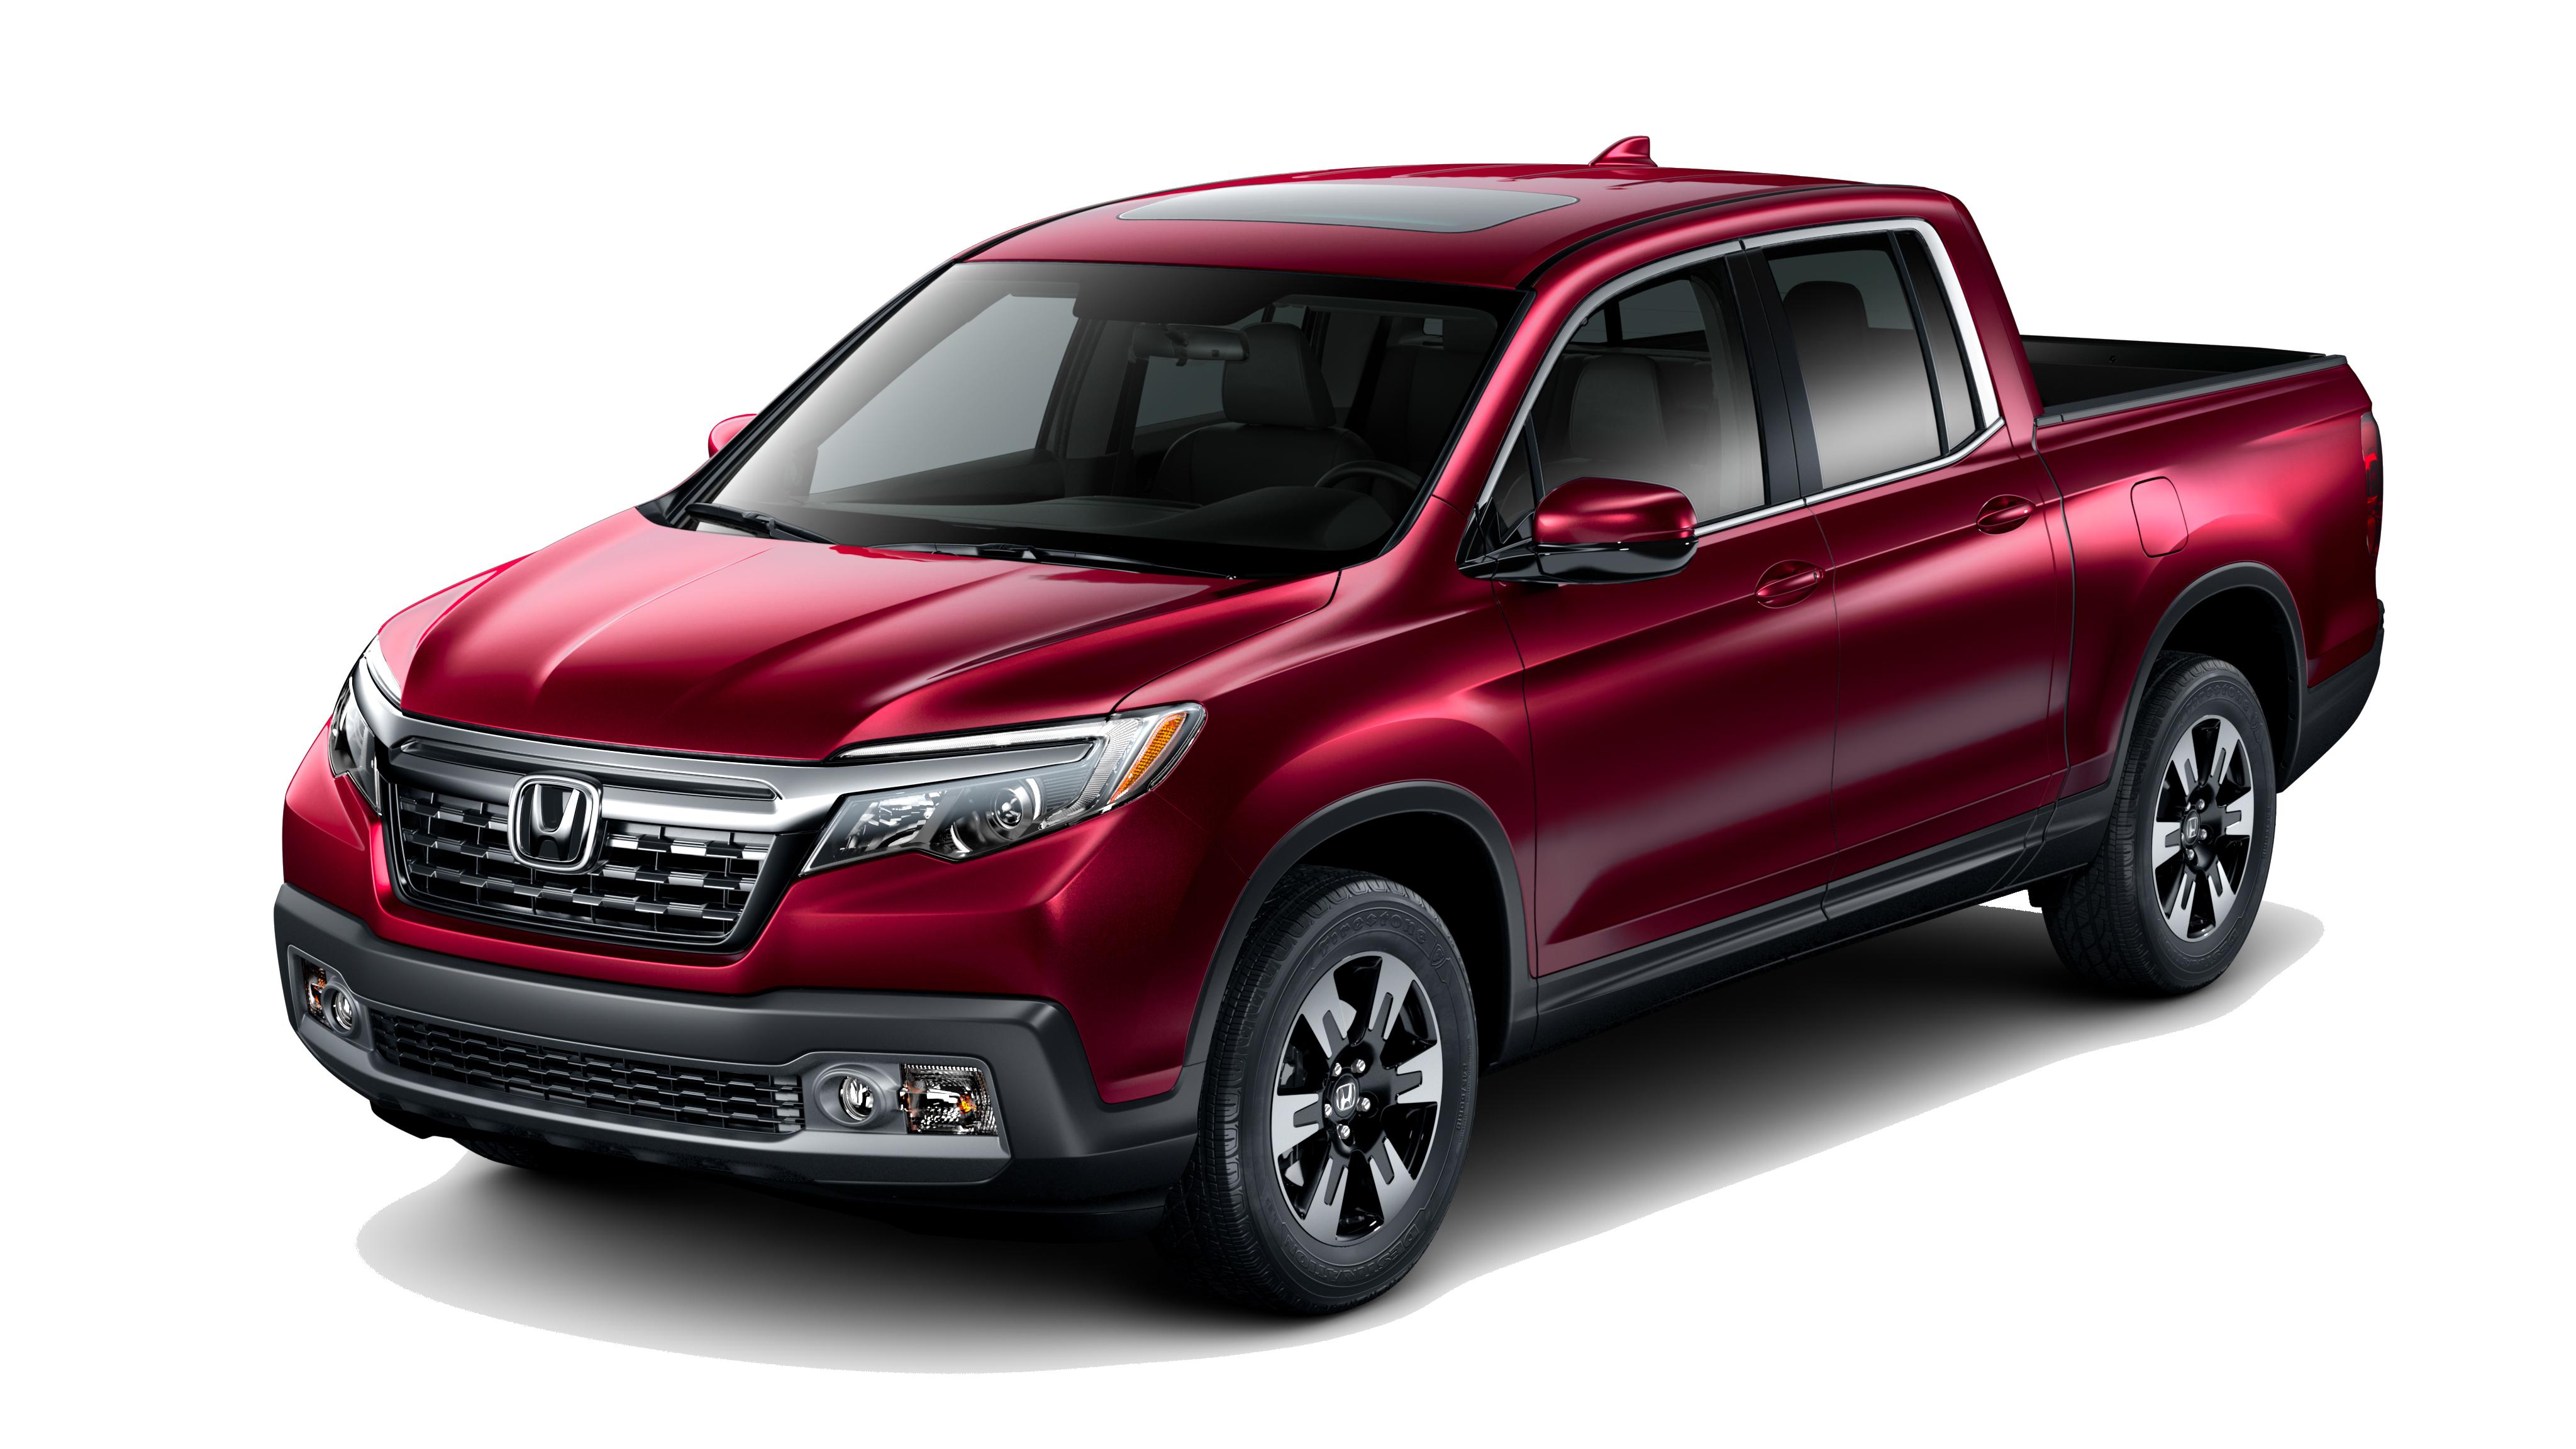 2018 Honda Ridgeline Model Overview   Livermore, CA   Livermore Honda